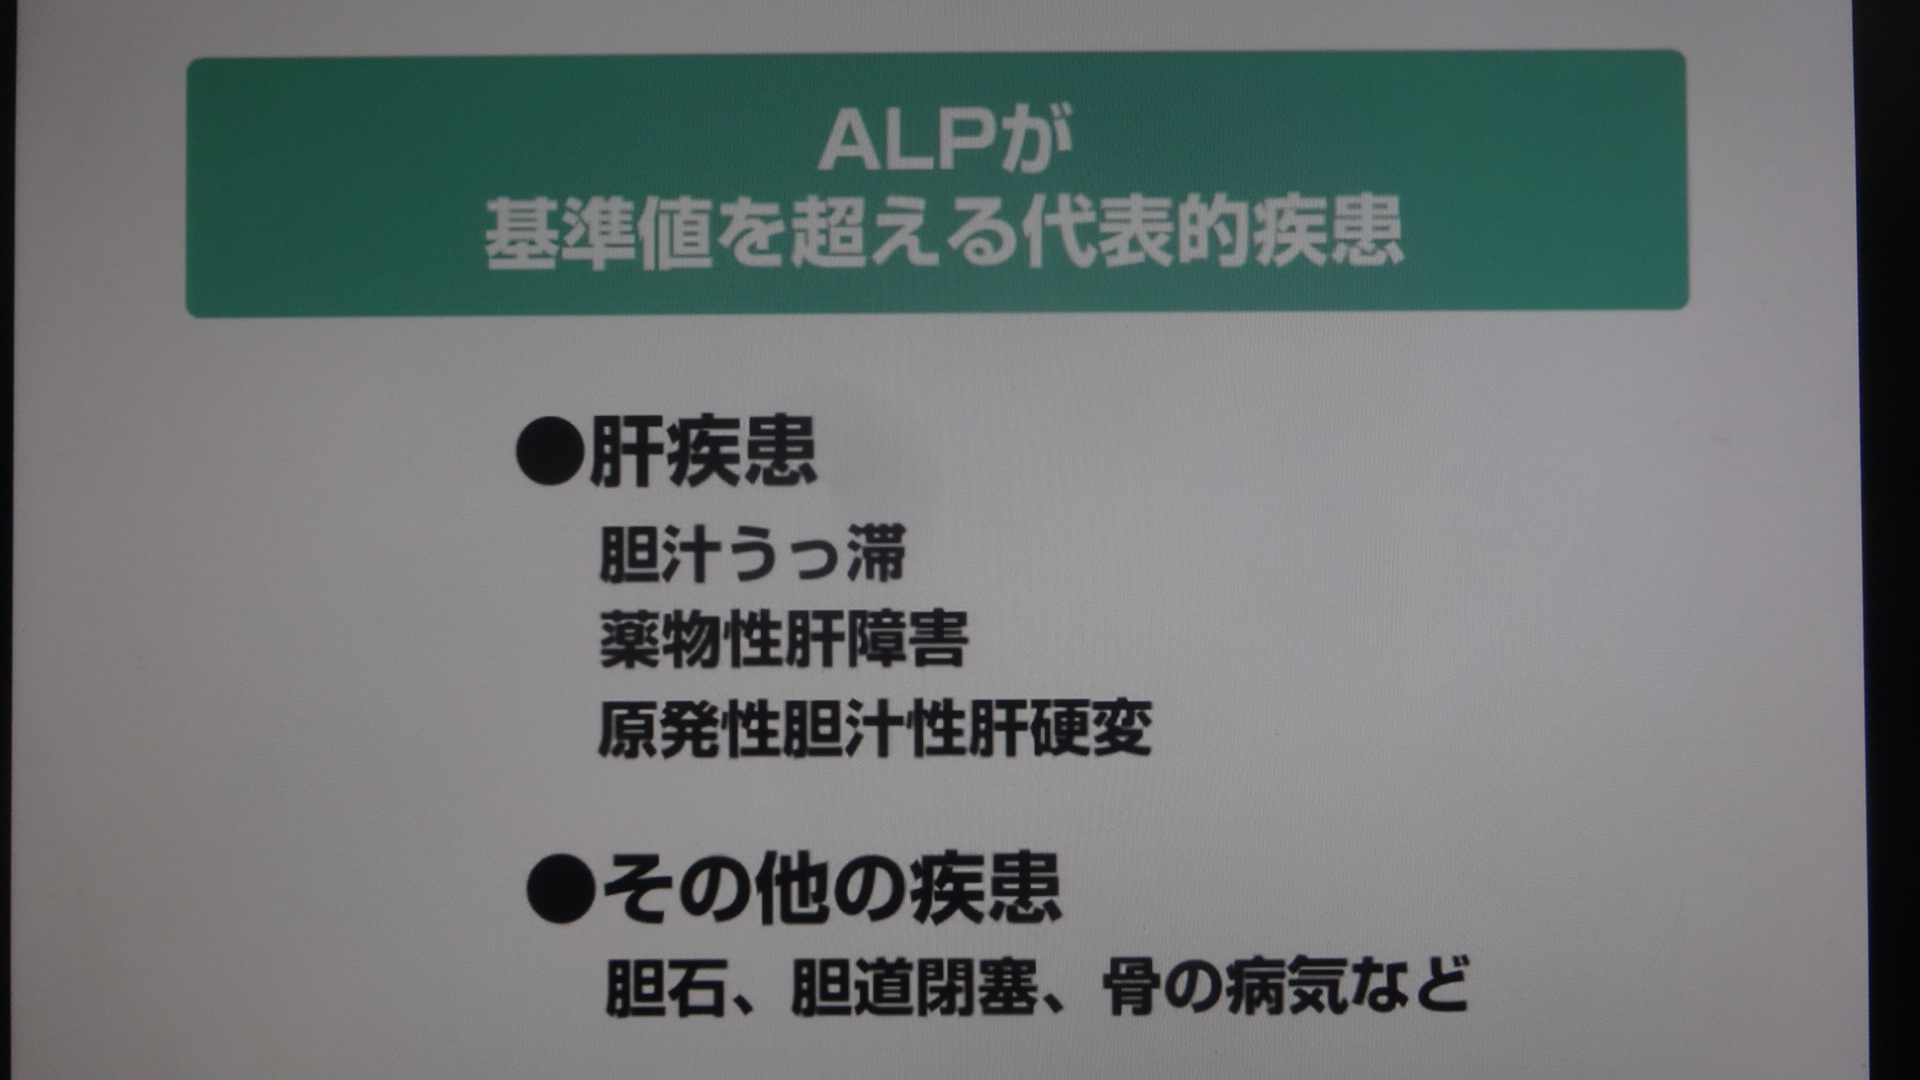 ALPが高値を示す疾患をまとめた図